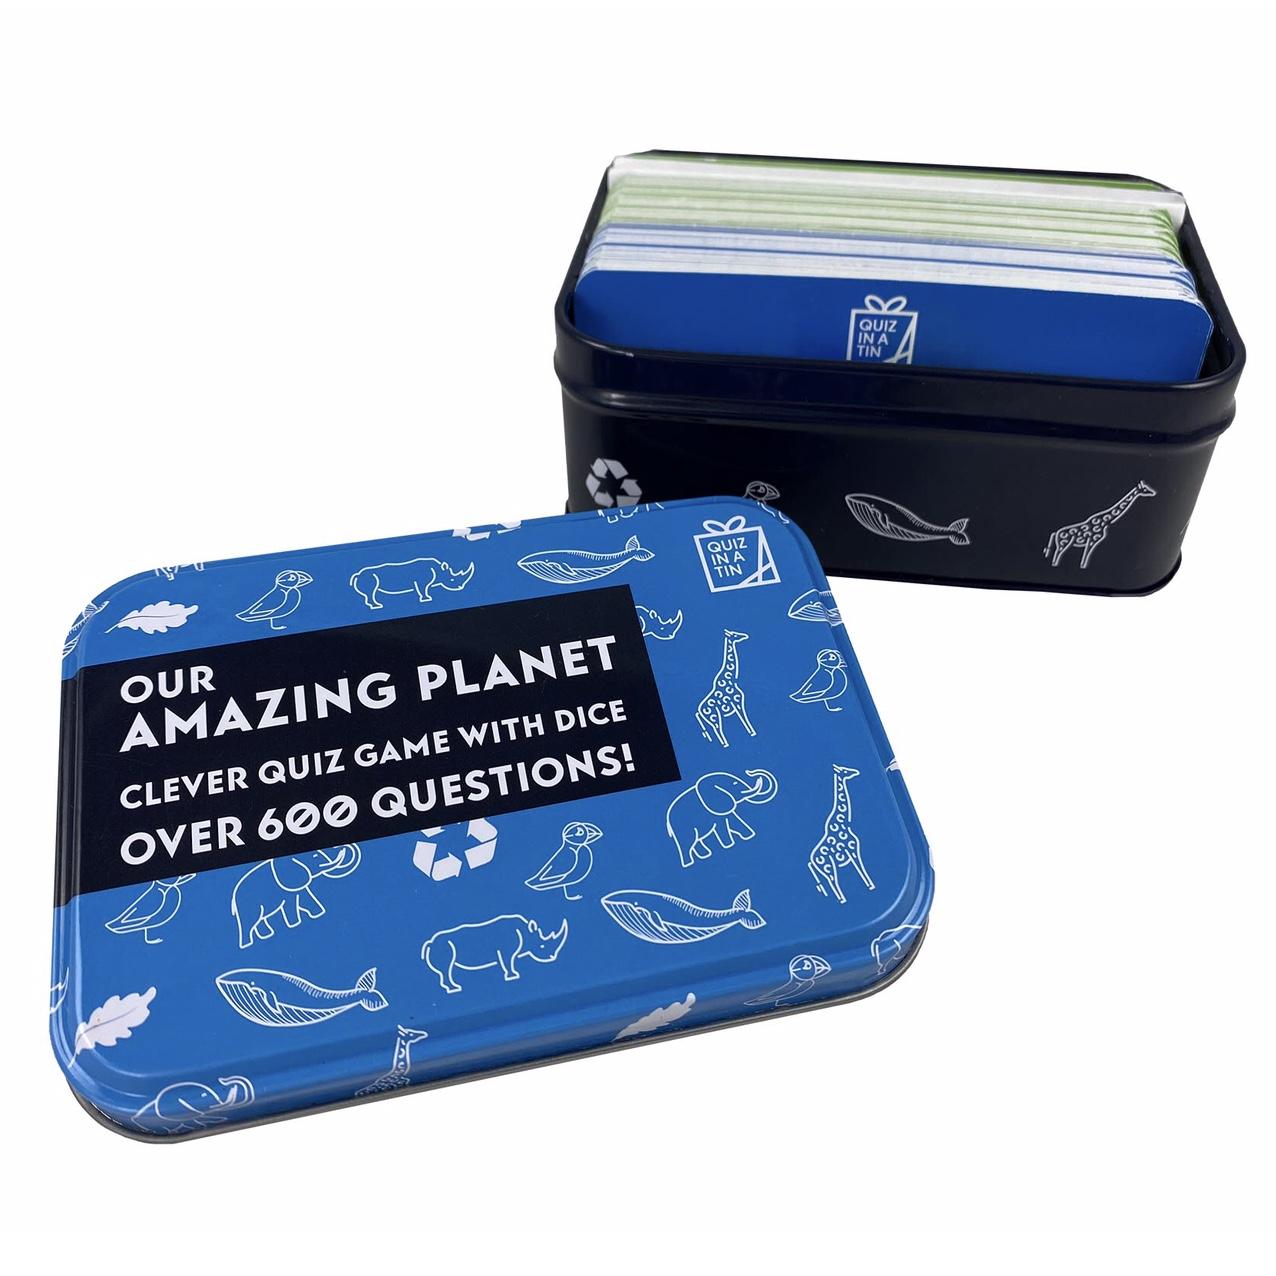 Our Amazing Planet Quiz